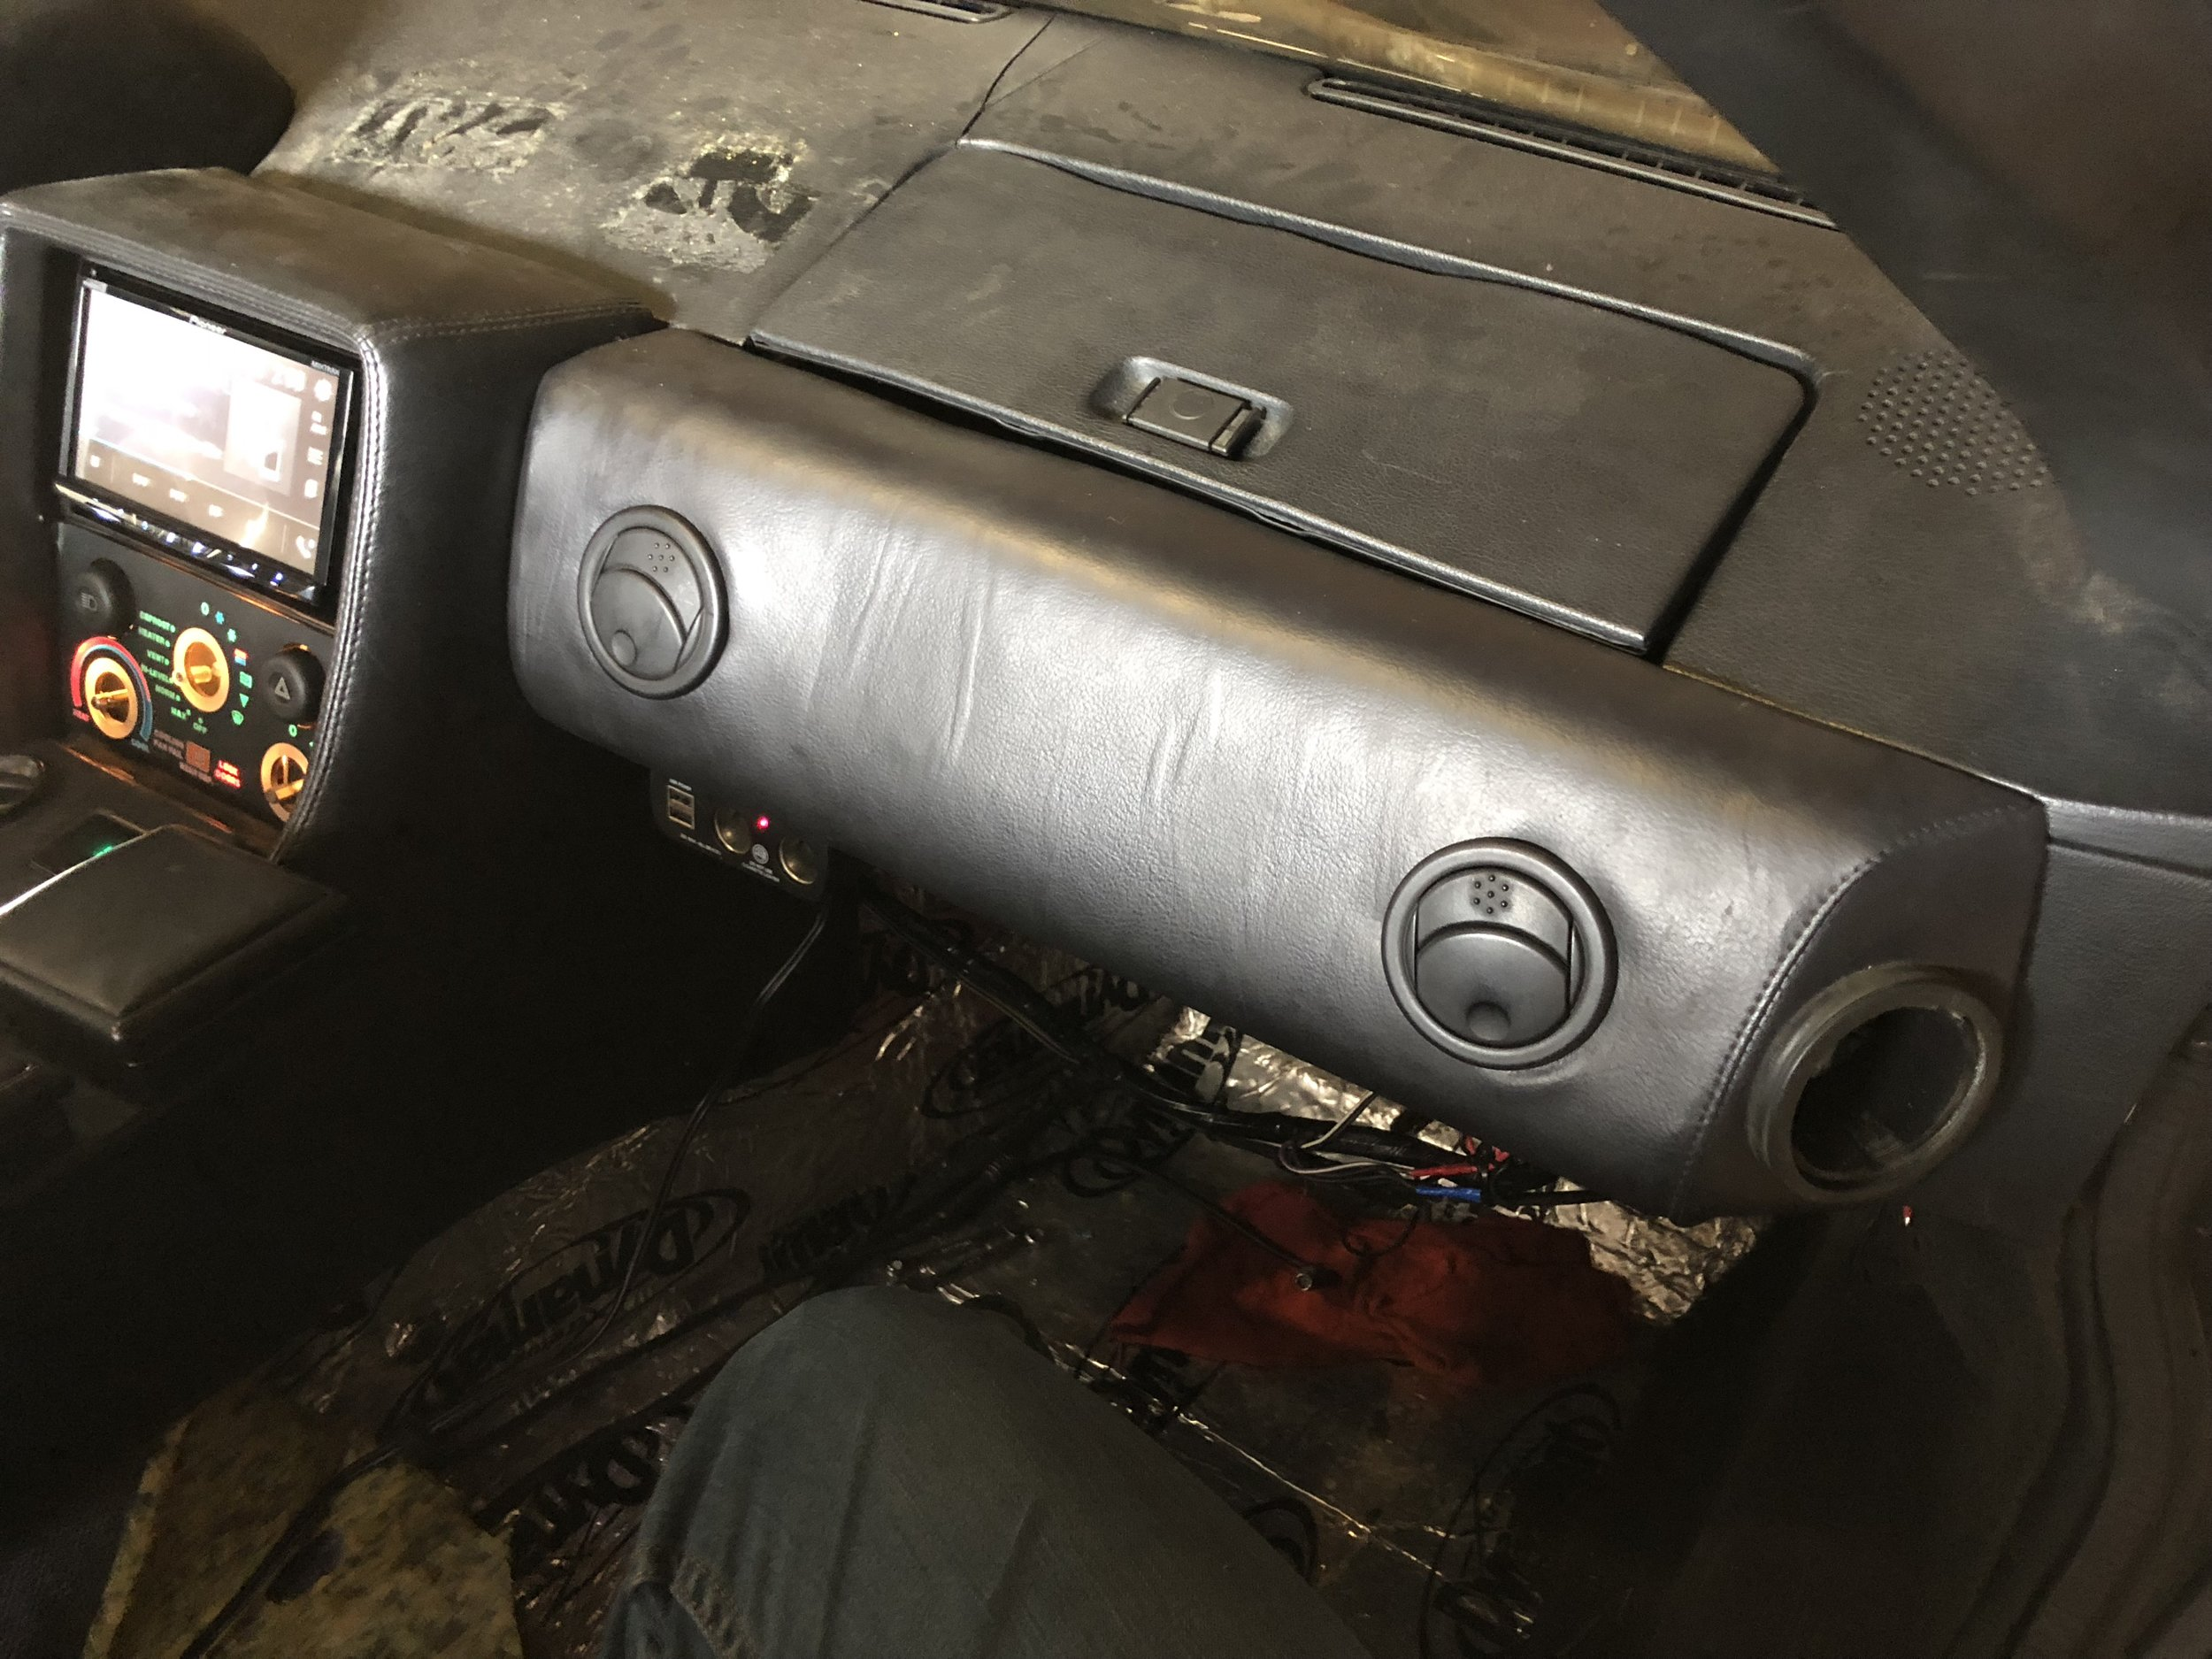 Passenger Knee Pad Installed